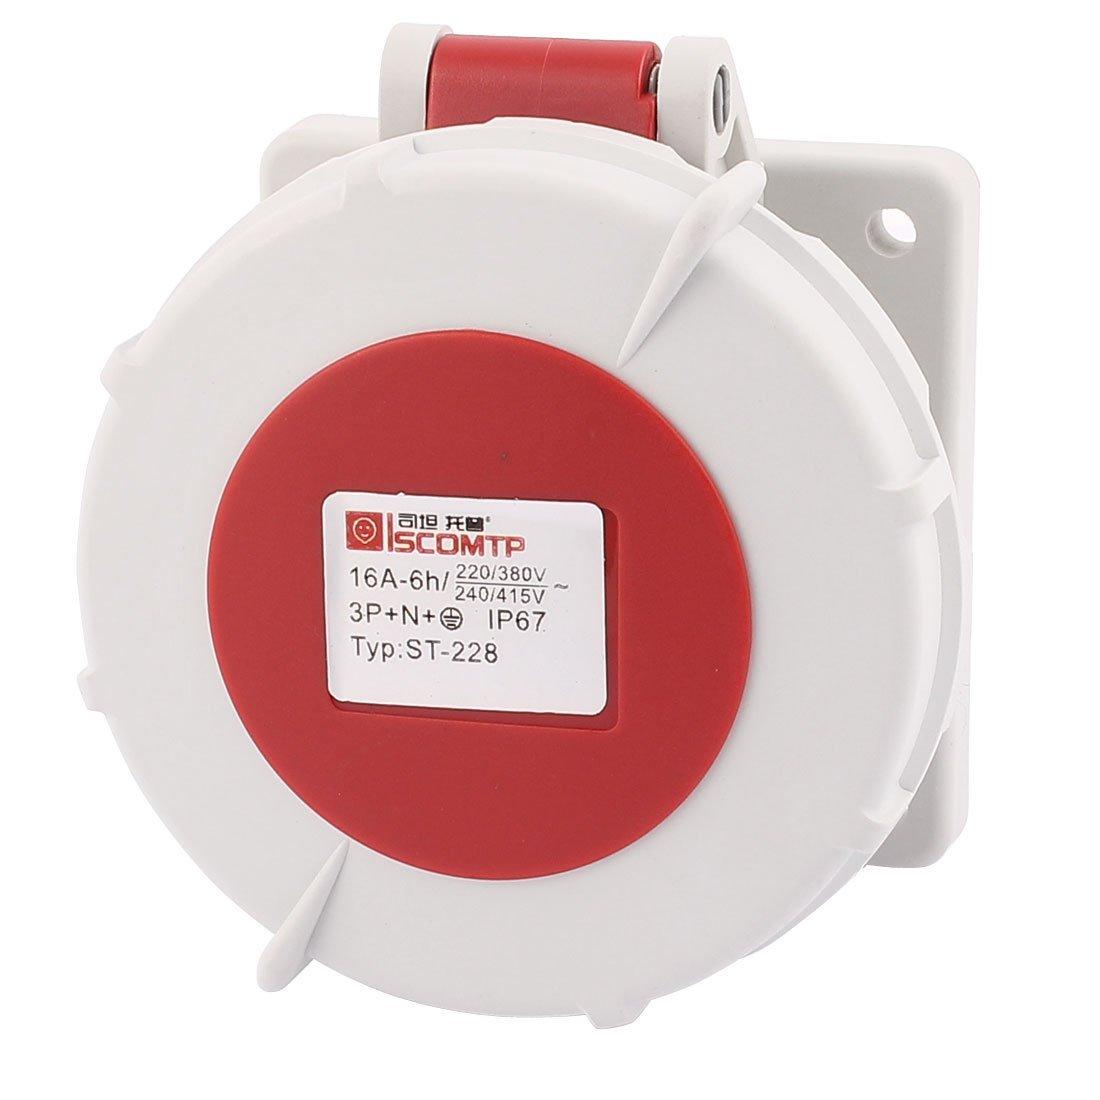 eDealMax AC 240V-415V 16A IP67 3P + N + E 5-terminal hembra Industrial Socket Straight - - Amazon.com